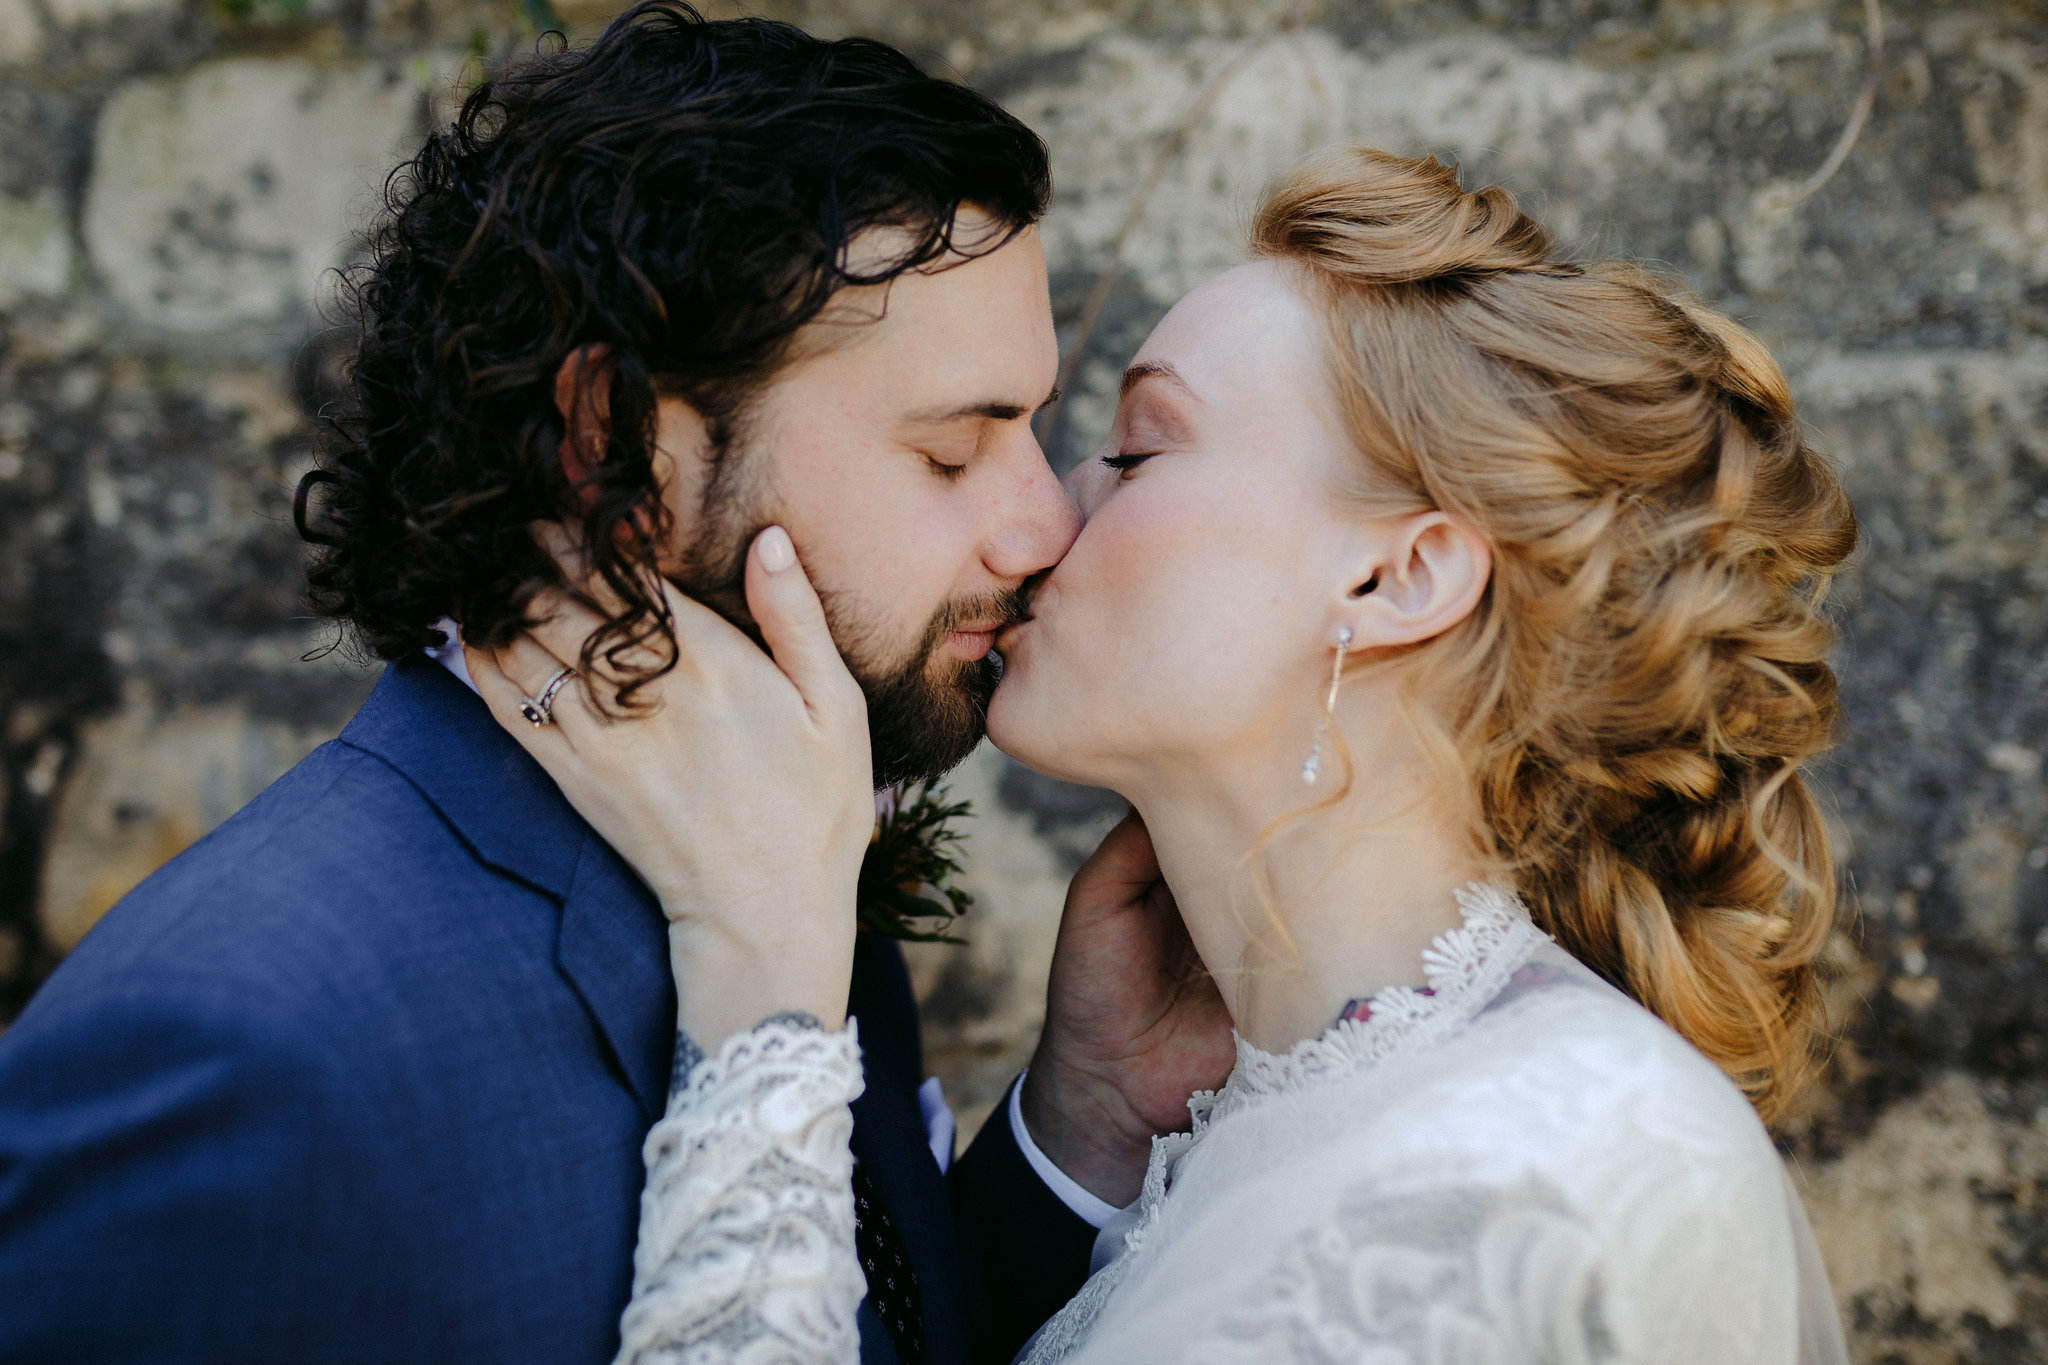 Paris_elopement_wedding_photographer-332.jpg